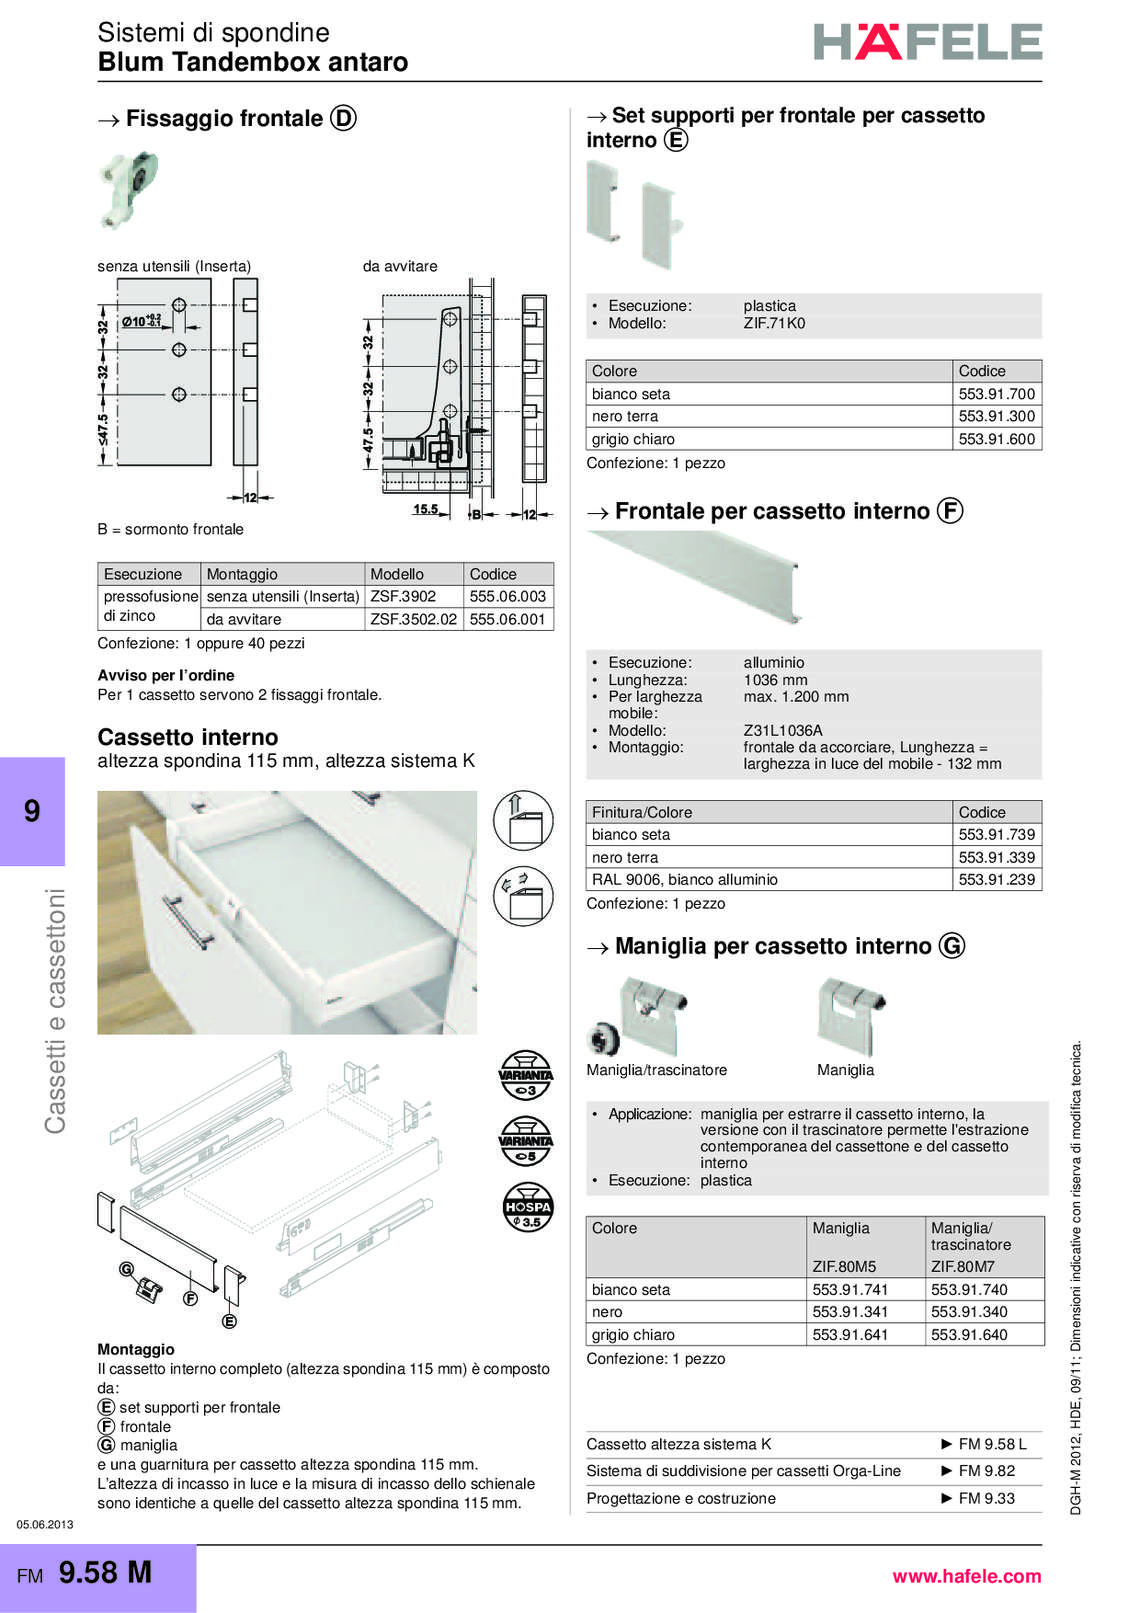 hafele-spondine-e-guide-per-mobili_40_087.jpg